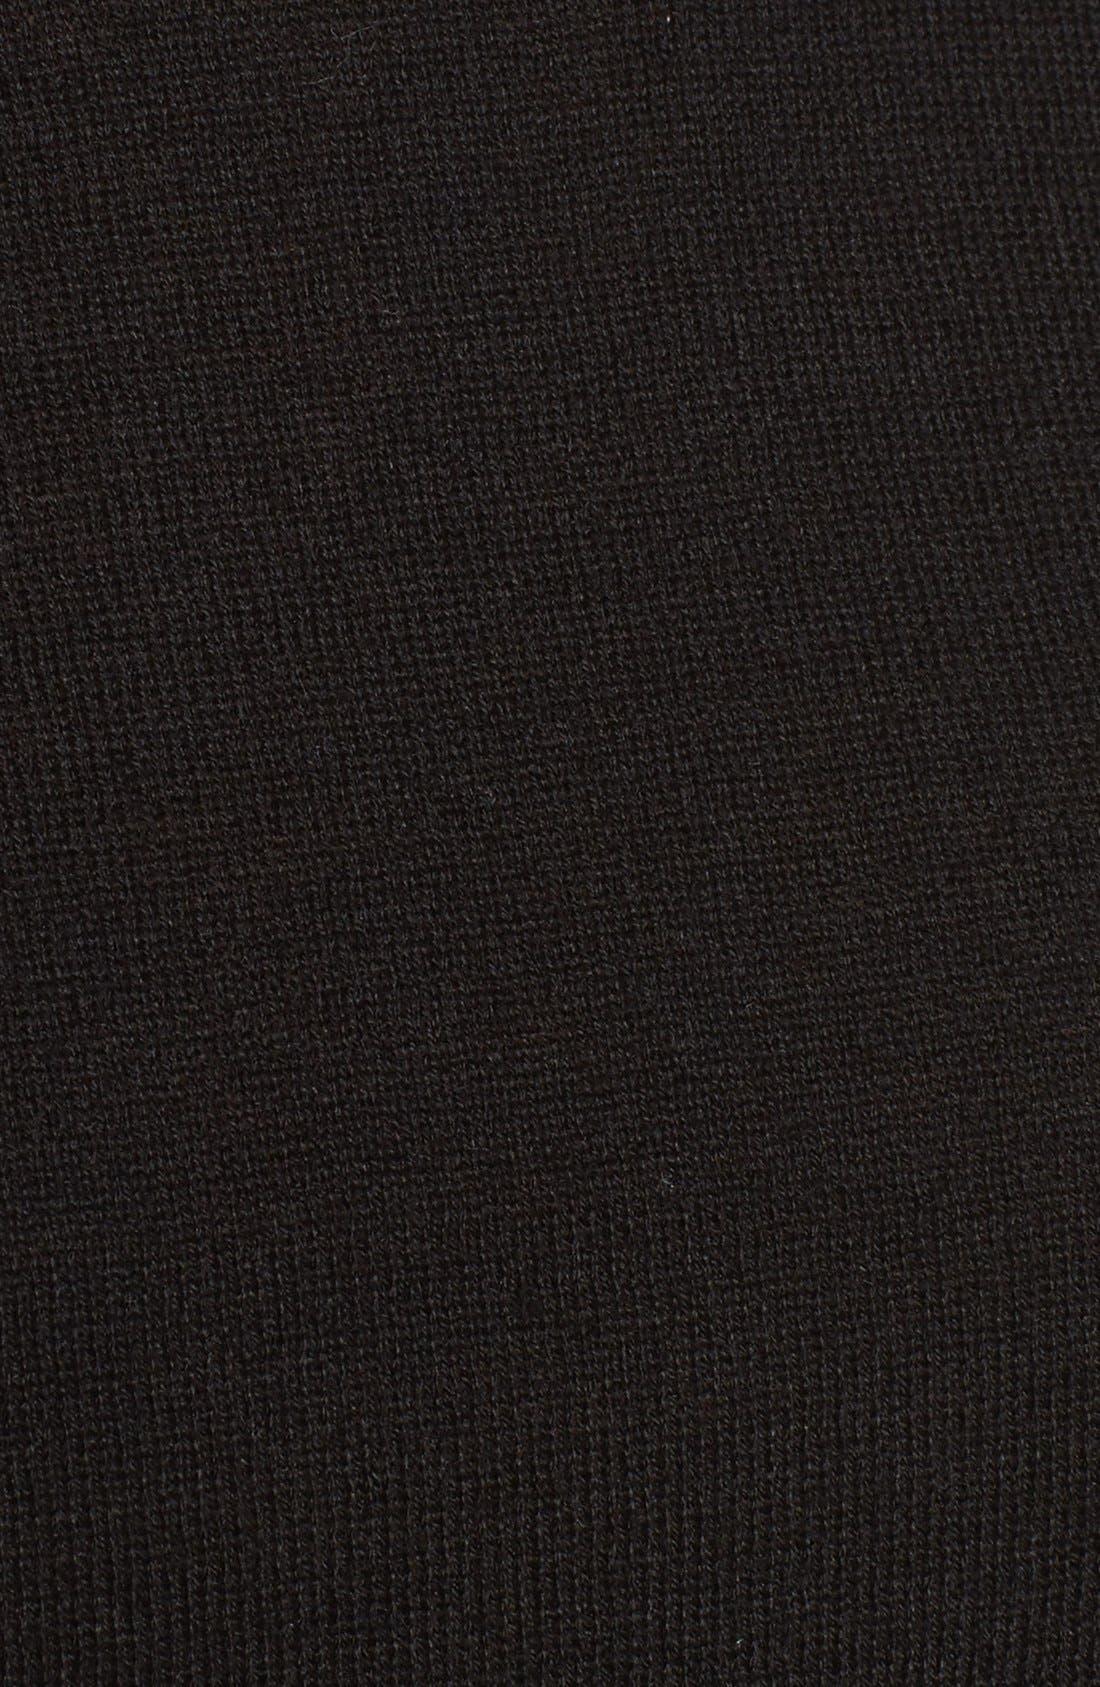 Cotton Blend Pullover,                             Alternate thumbnail 159, color,